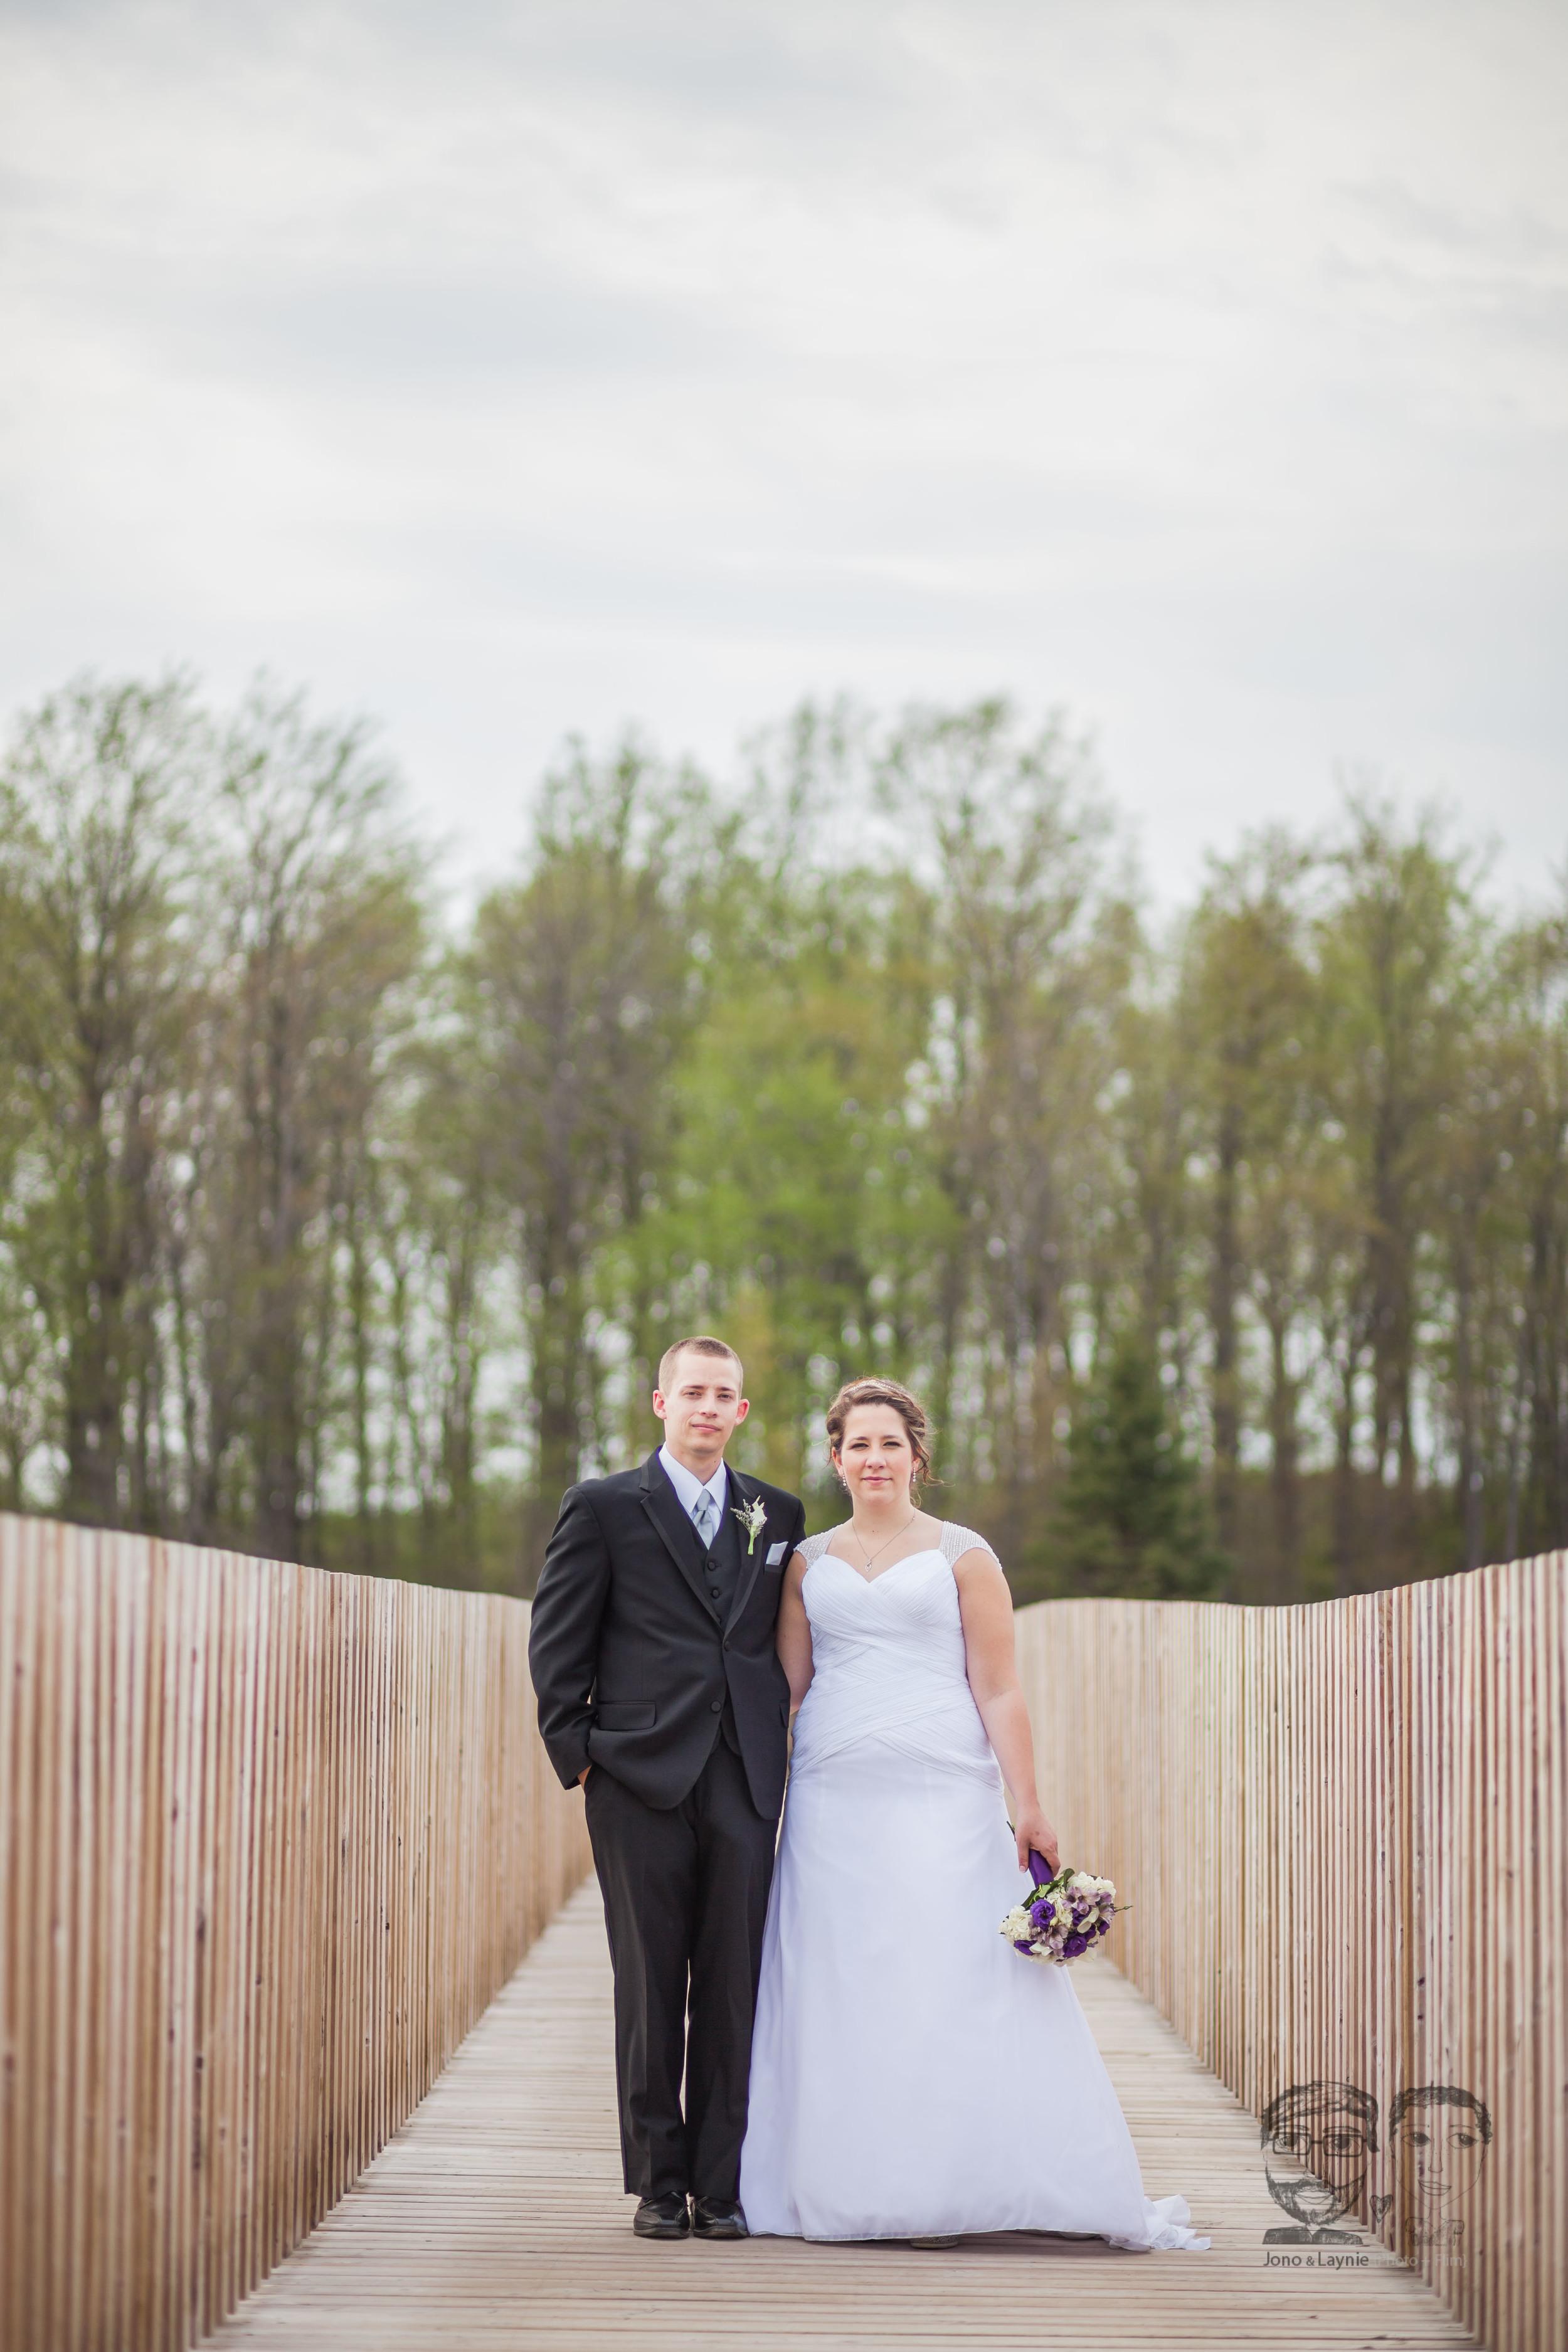 34Toronto Wedding Photographers and Videographers-Jono & Laynie Co.-Orangeville Wedding.jpg